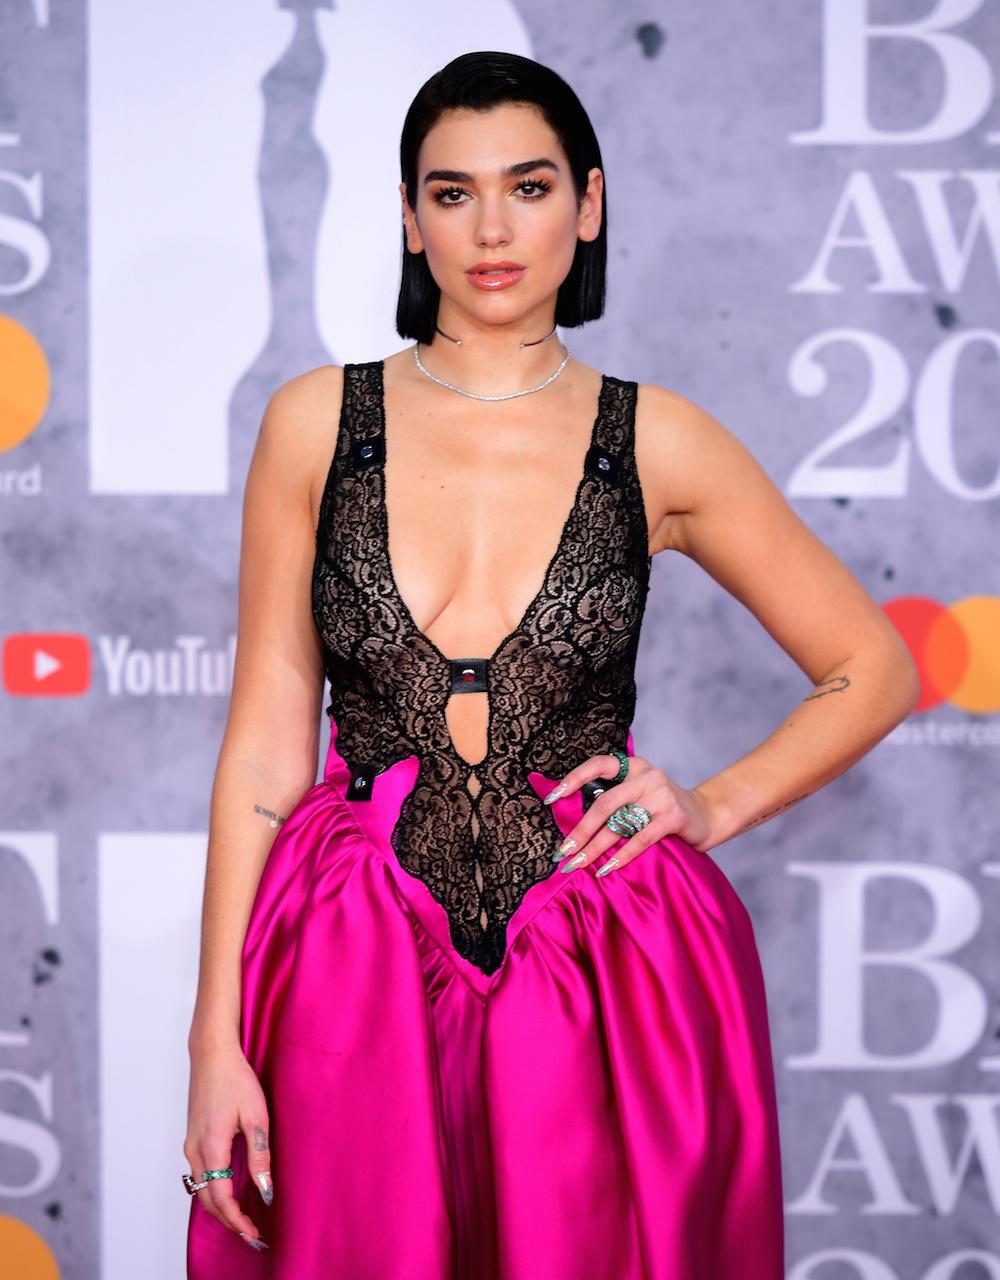 Dua Lipa attending the Brit Awards 2019